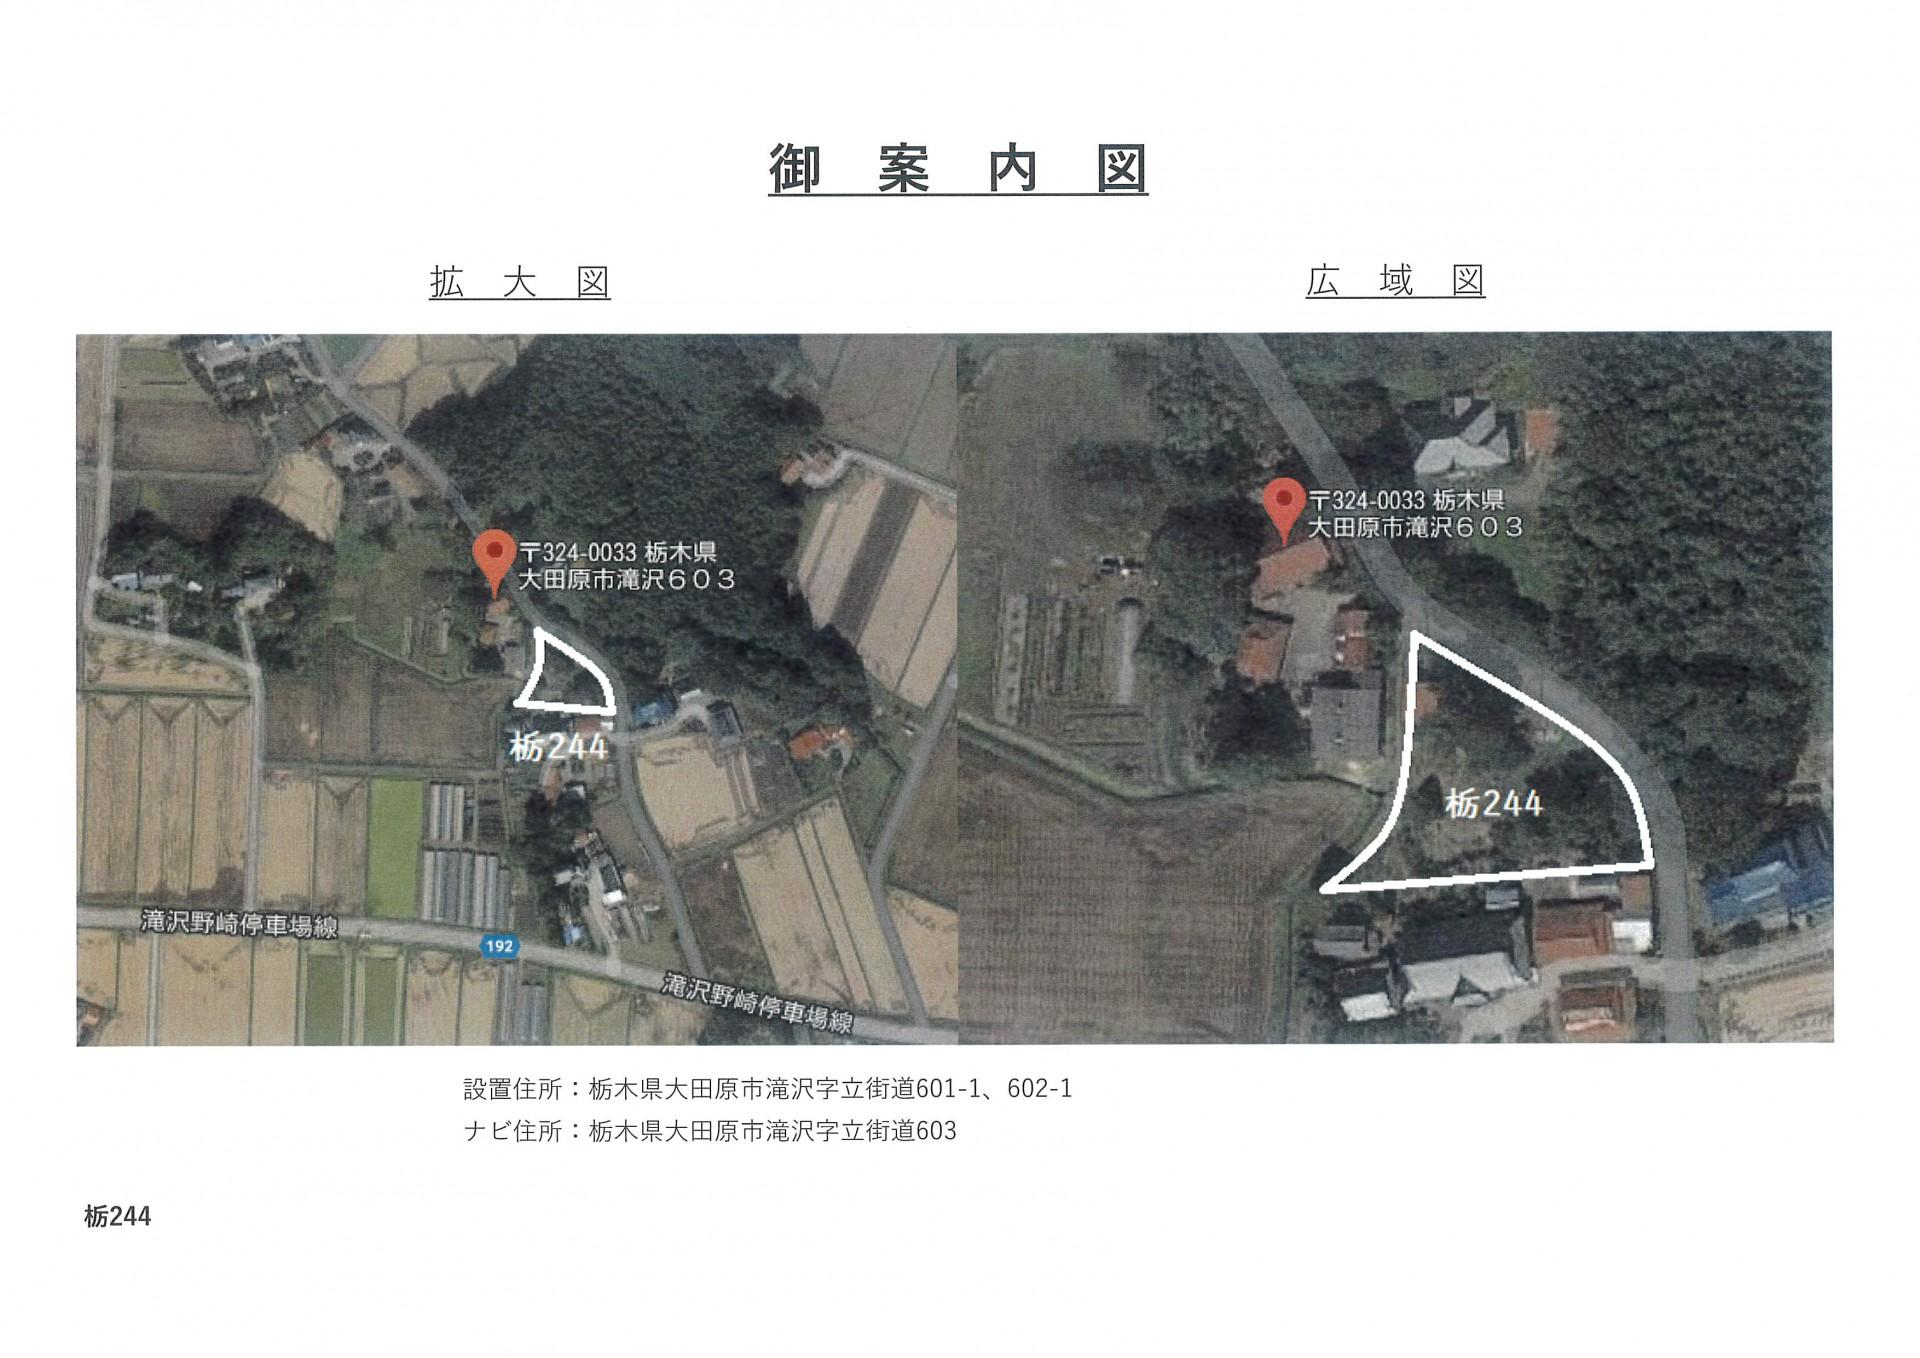 【GSC】FIT24円栃木県大田原市 栃244のメイン画像